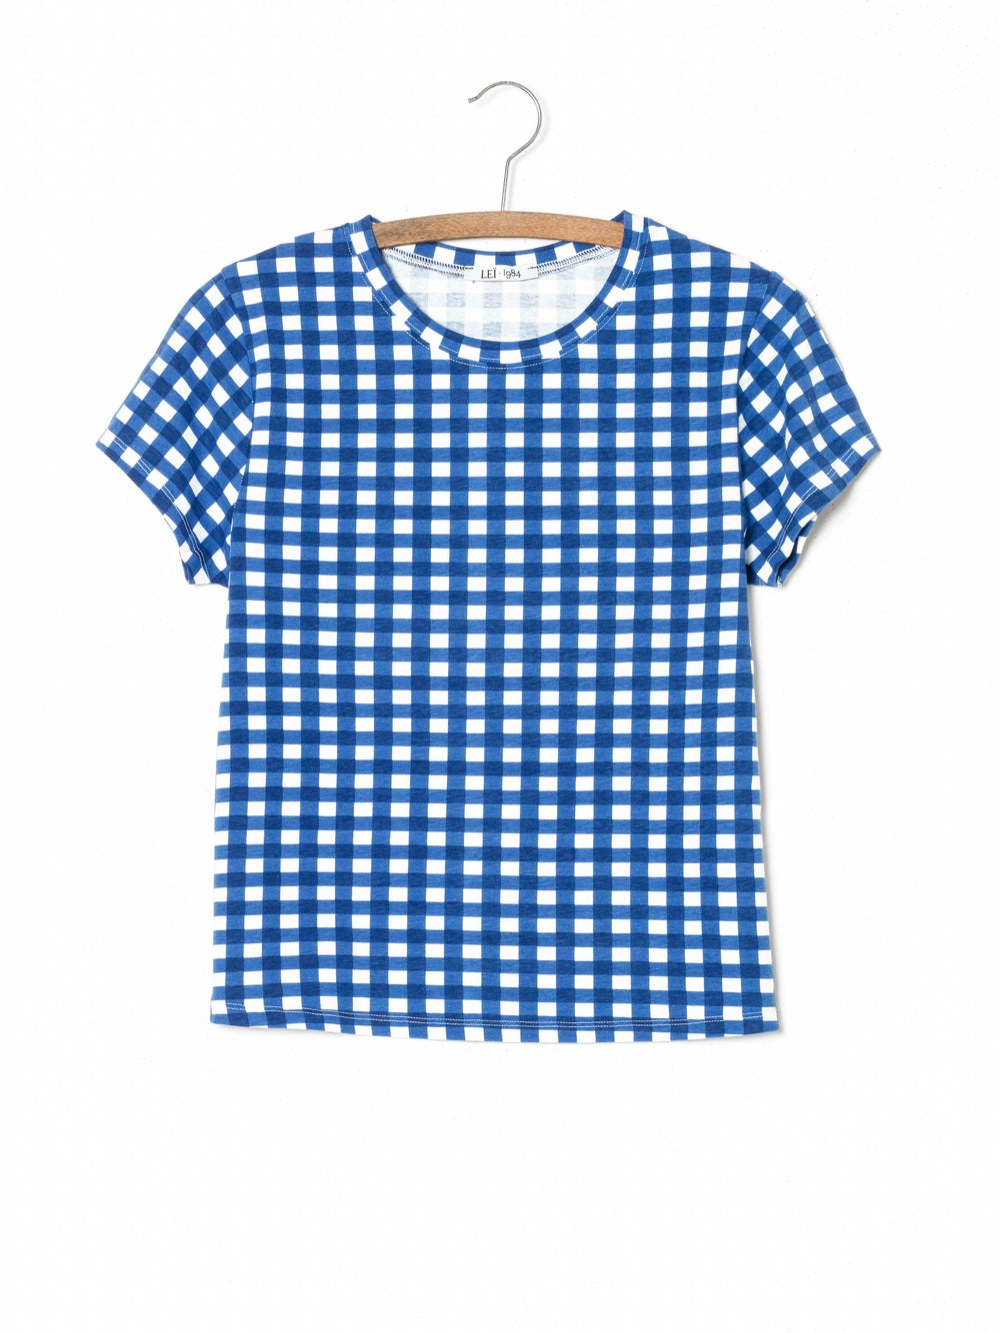 Image of Tee-shirt PRUNE imprimé vichy 55€ -30%